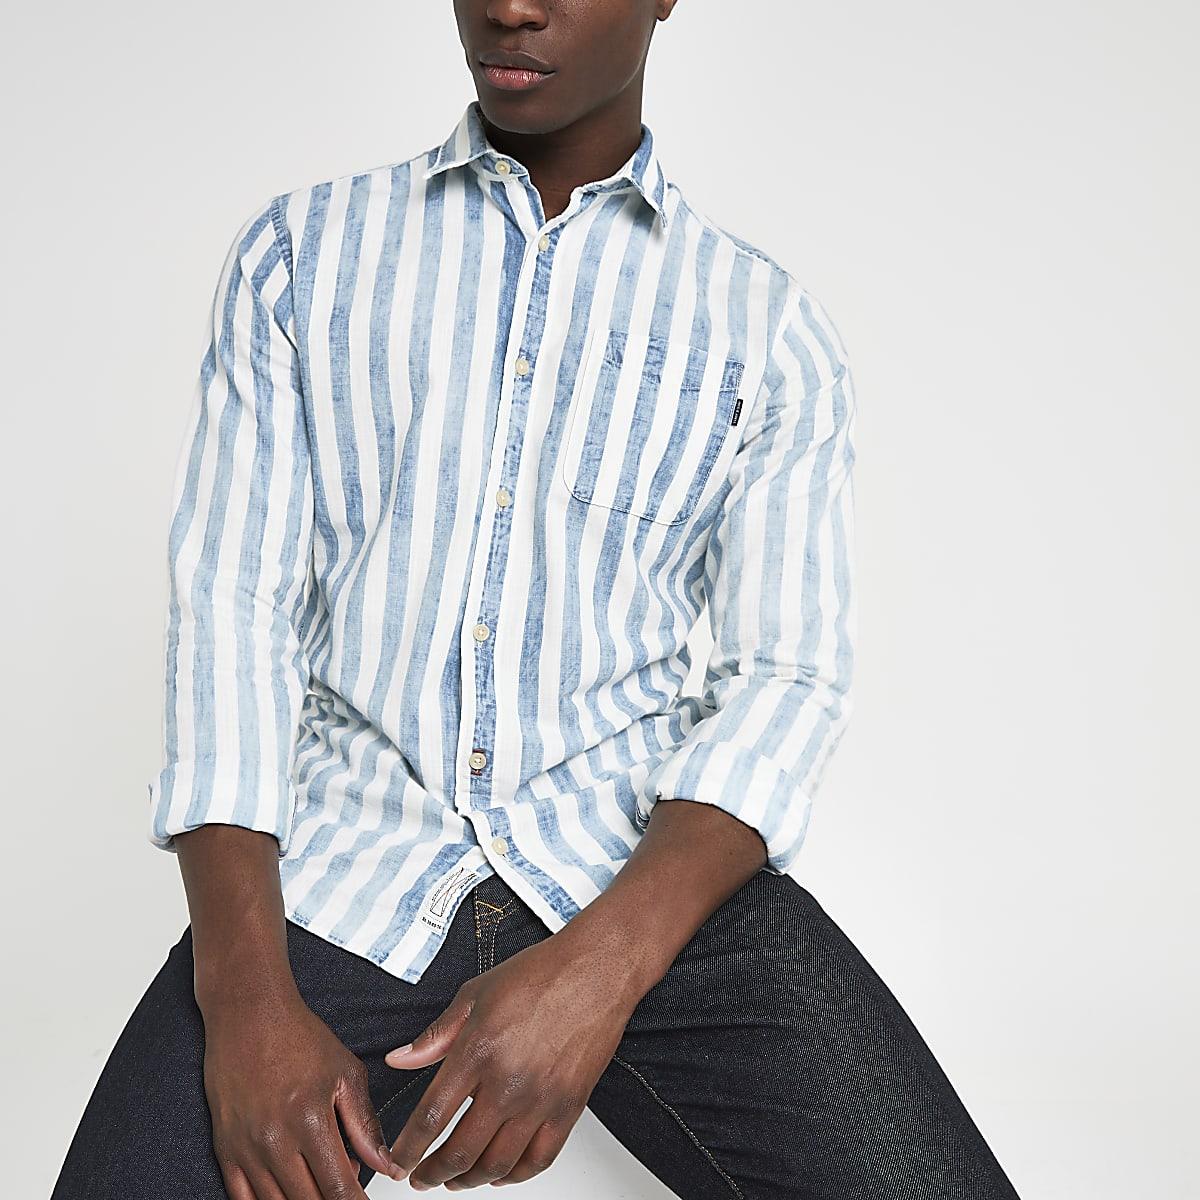 Jack and Jones blue stripe slim fit shirt